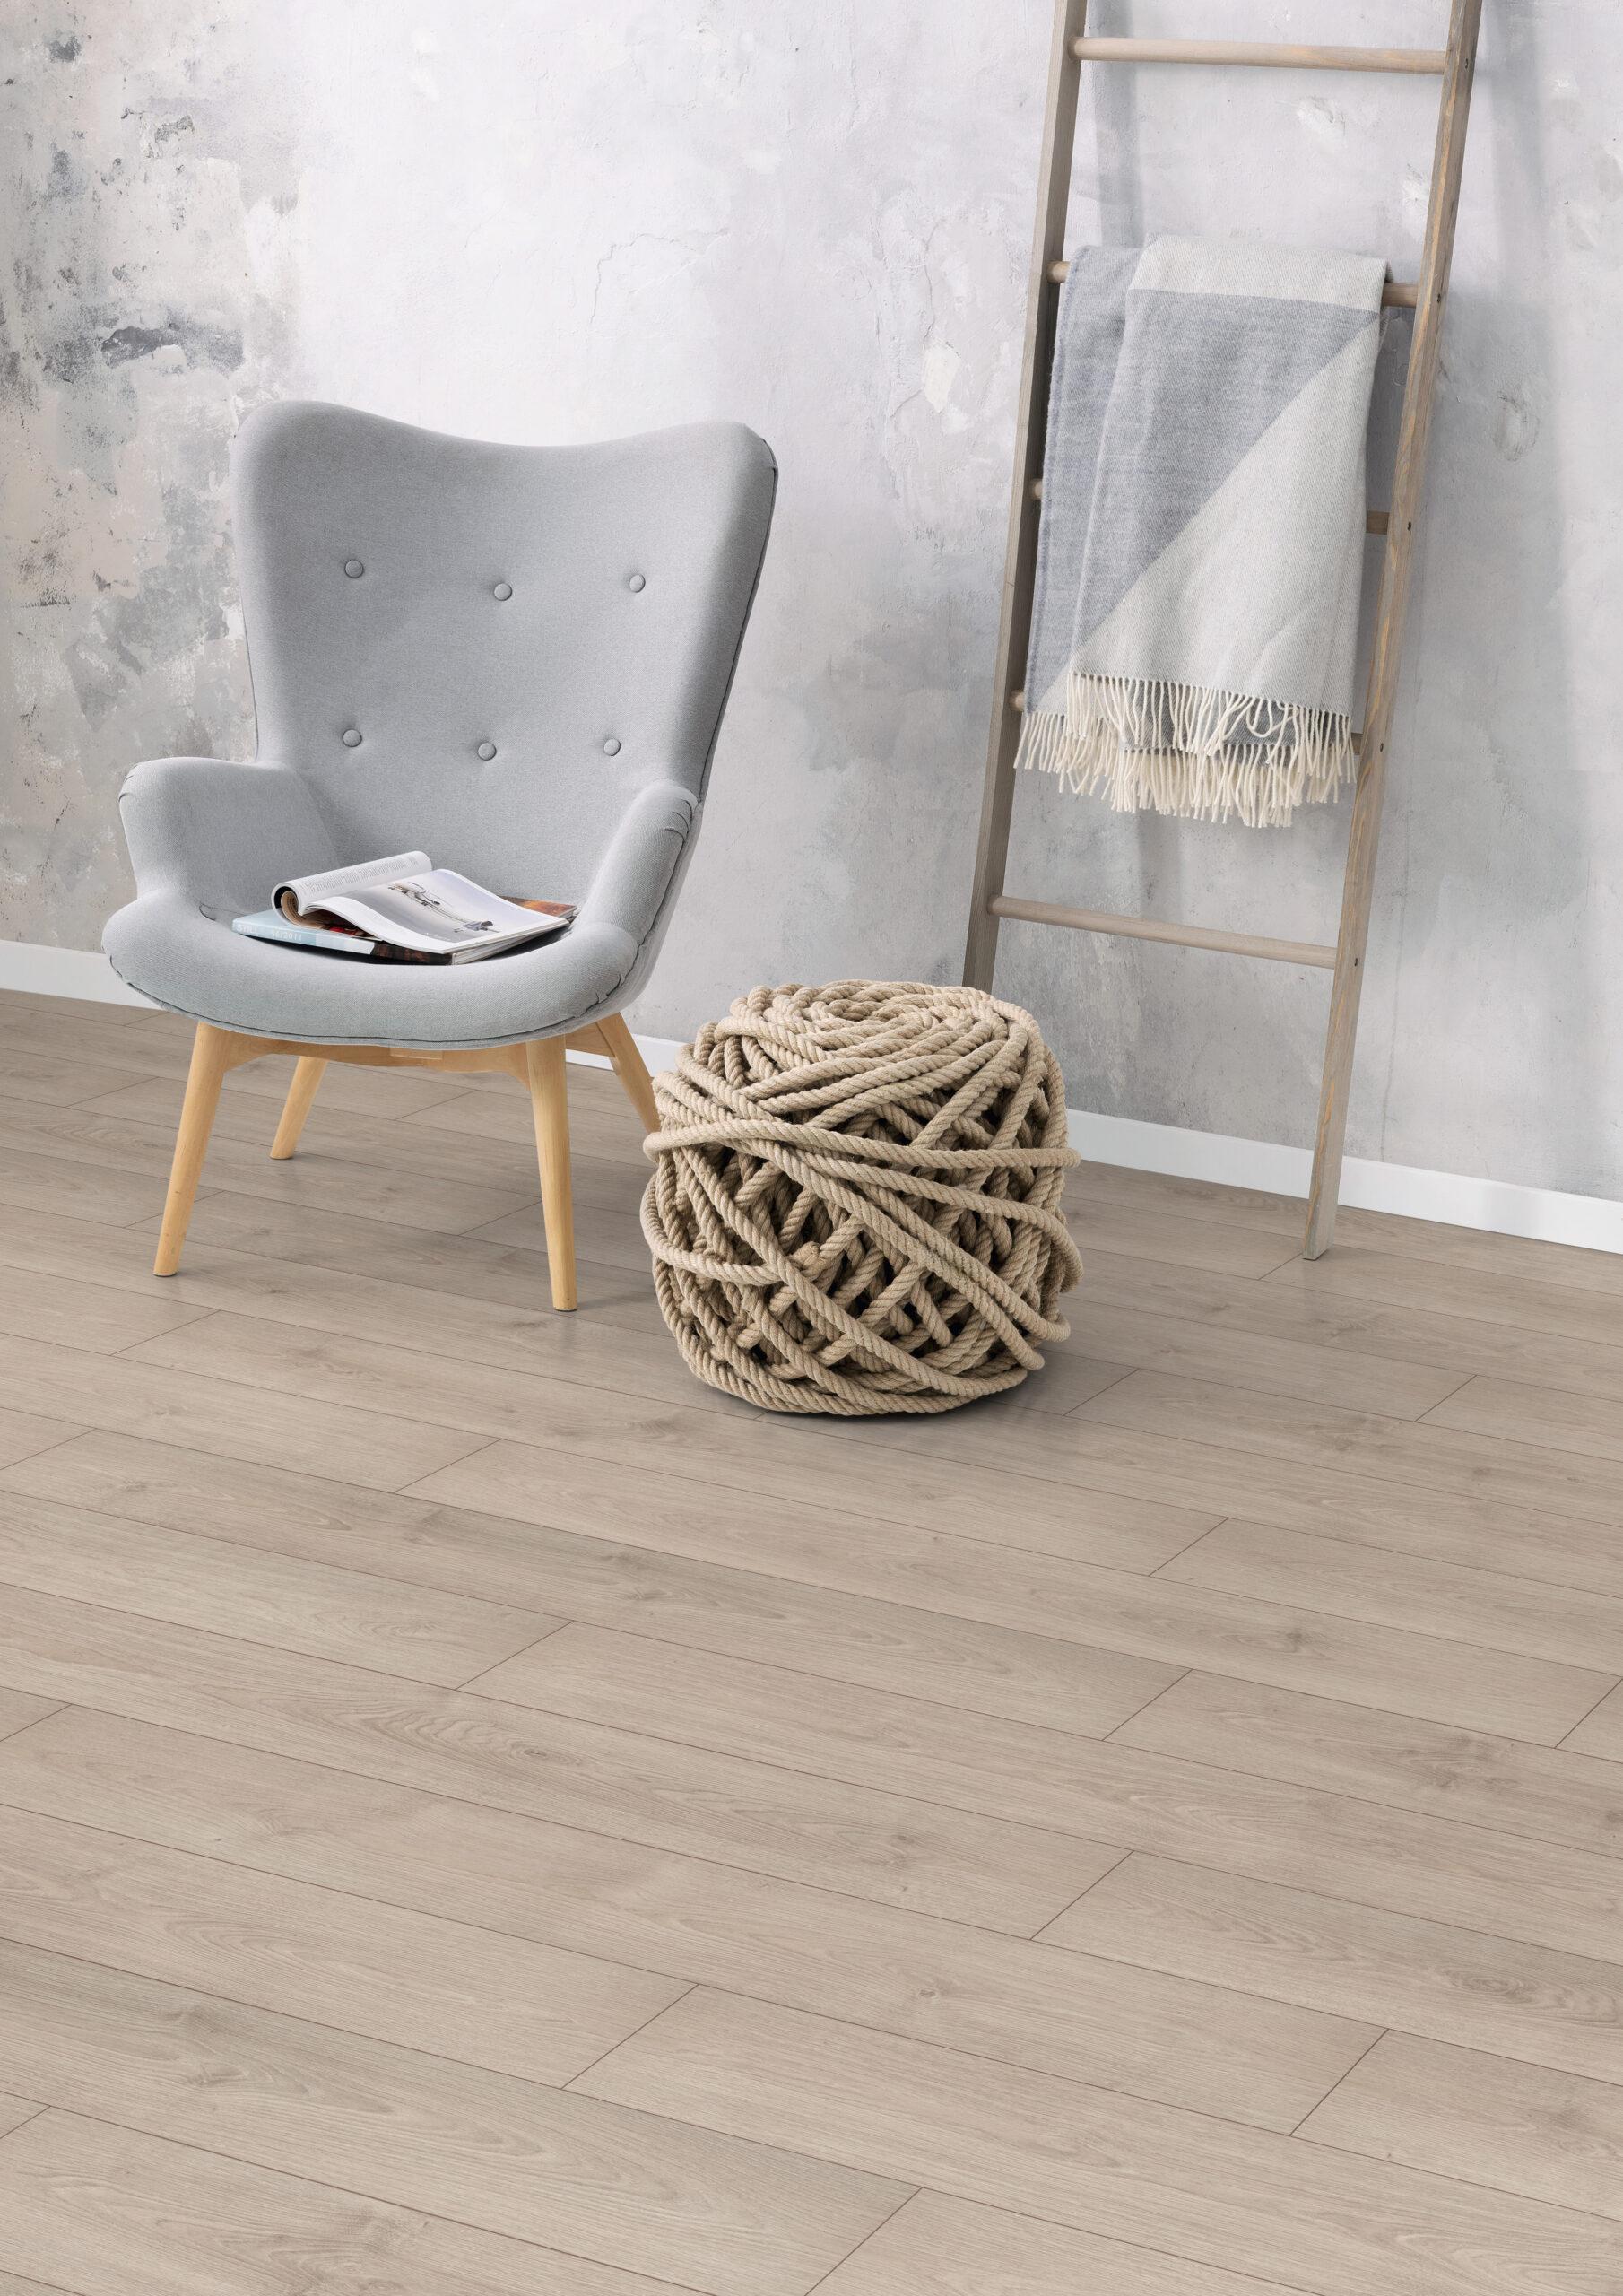 application;chair;Living Area;magazine;planket